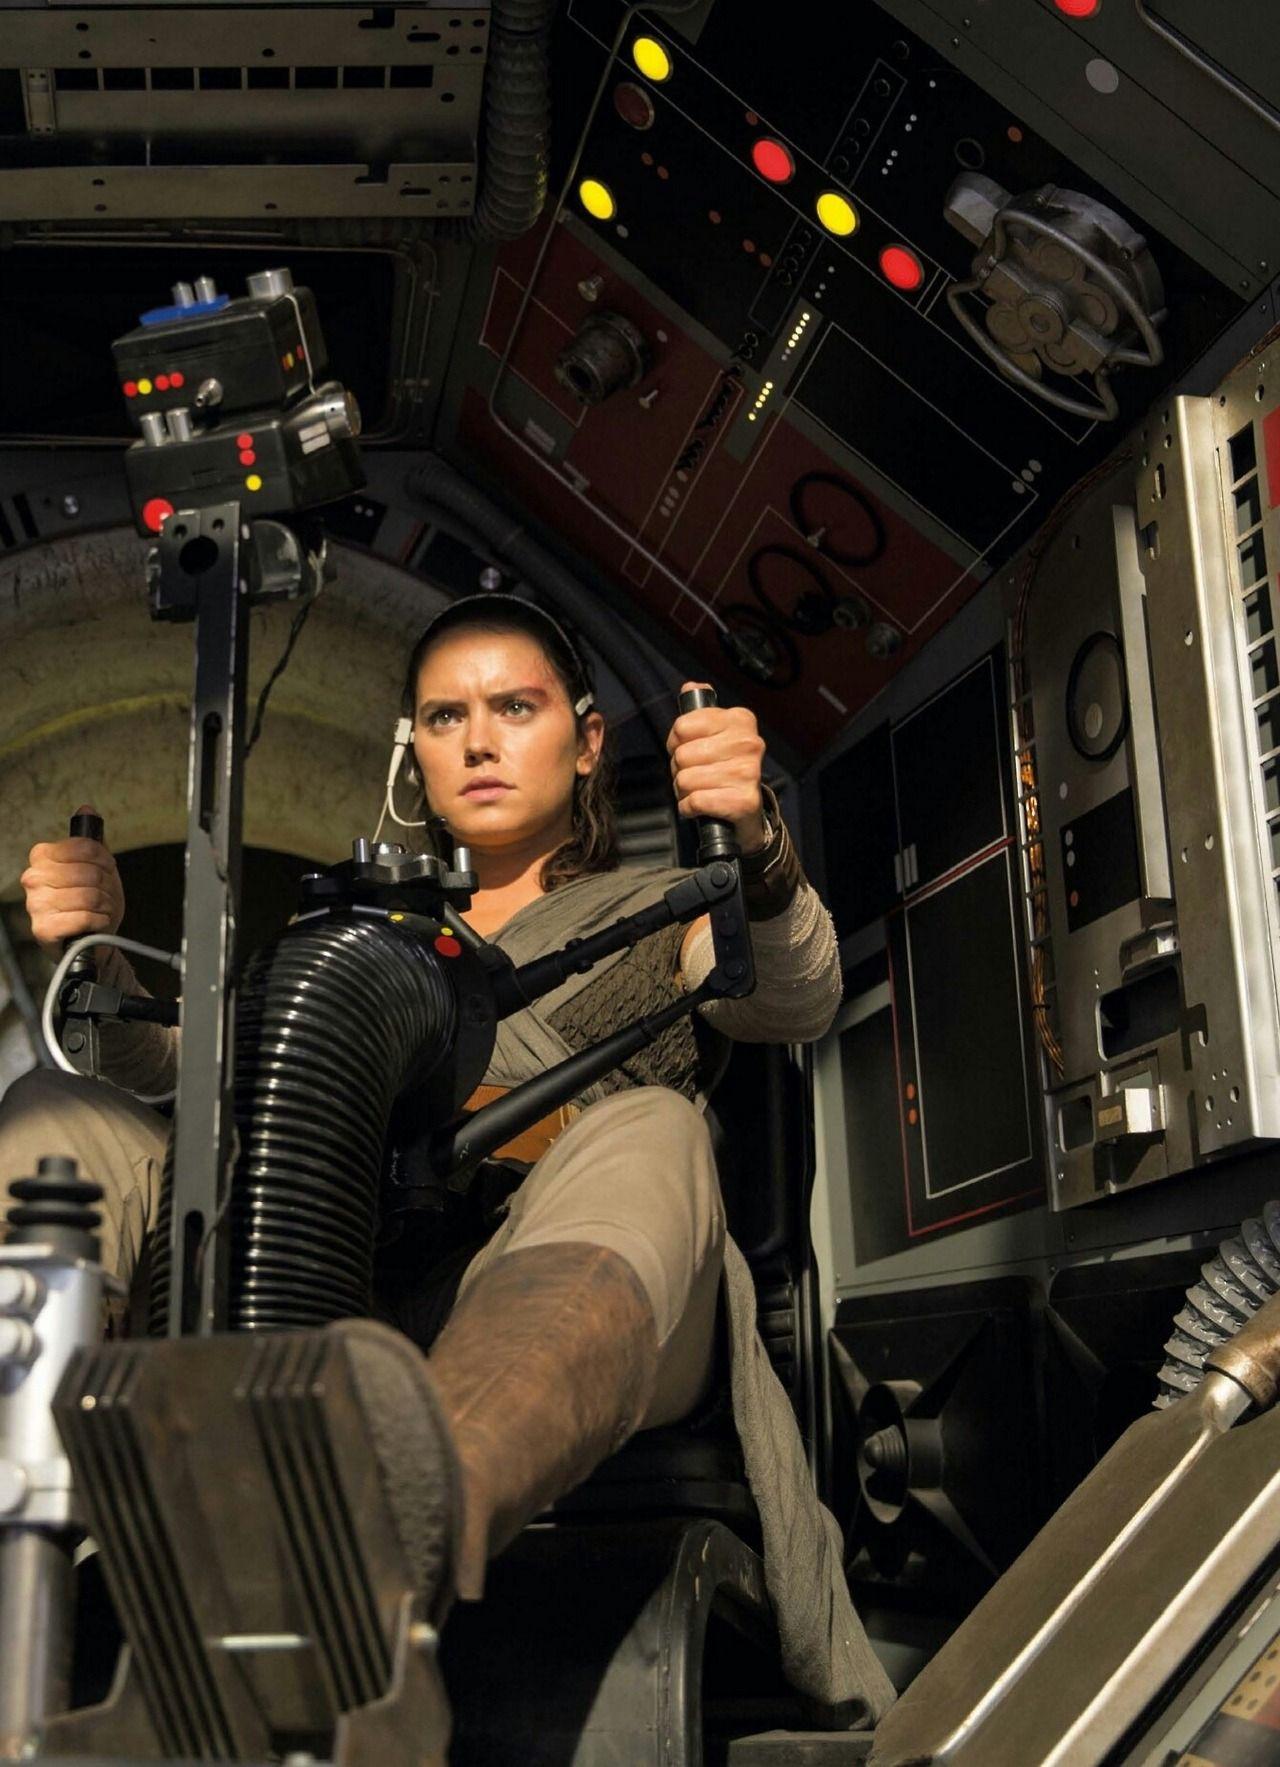 Daisy Ridley As Rey In Star Wars The Last Jedi Via Dailyrey Rey Star Wars Star Wars Movie Star Wars Vii